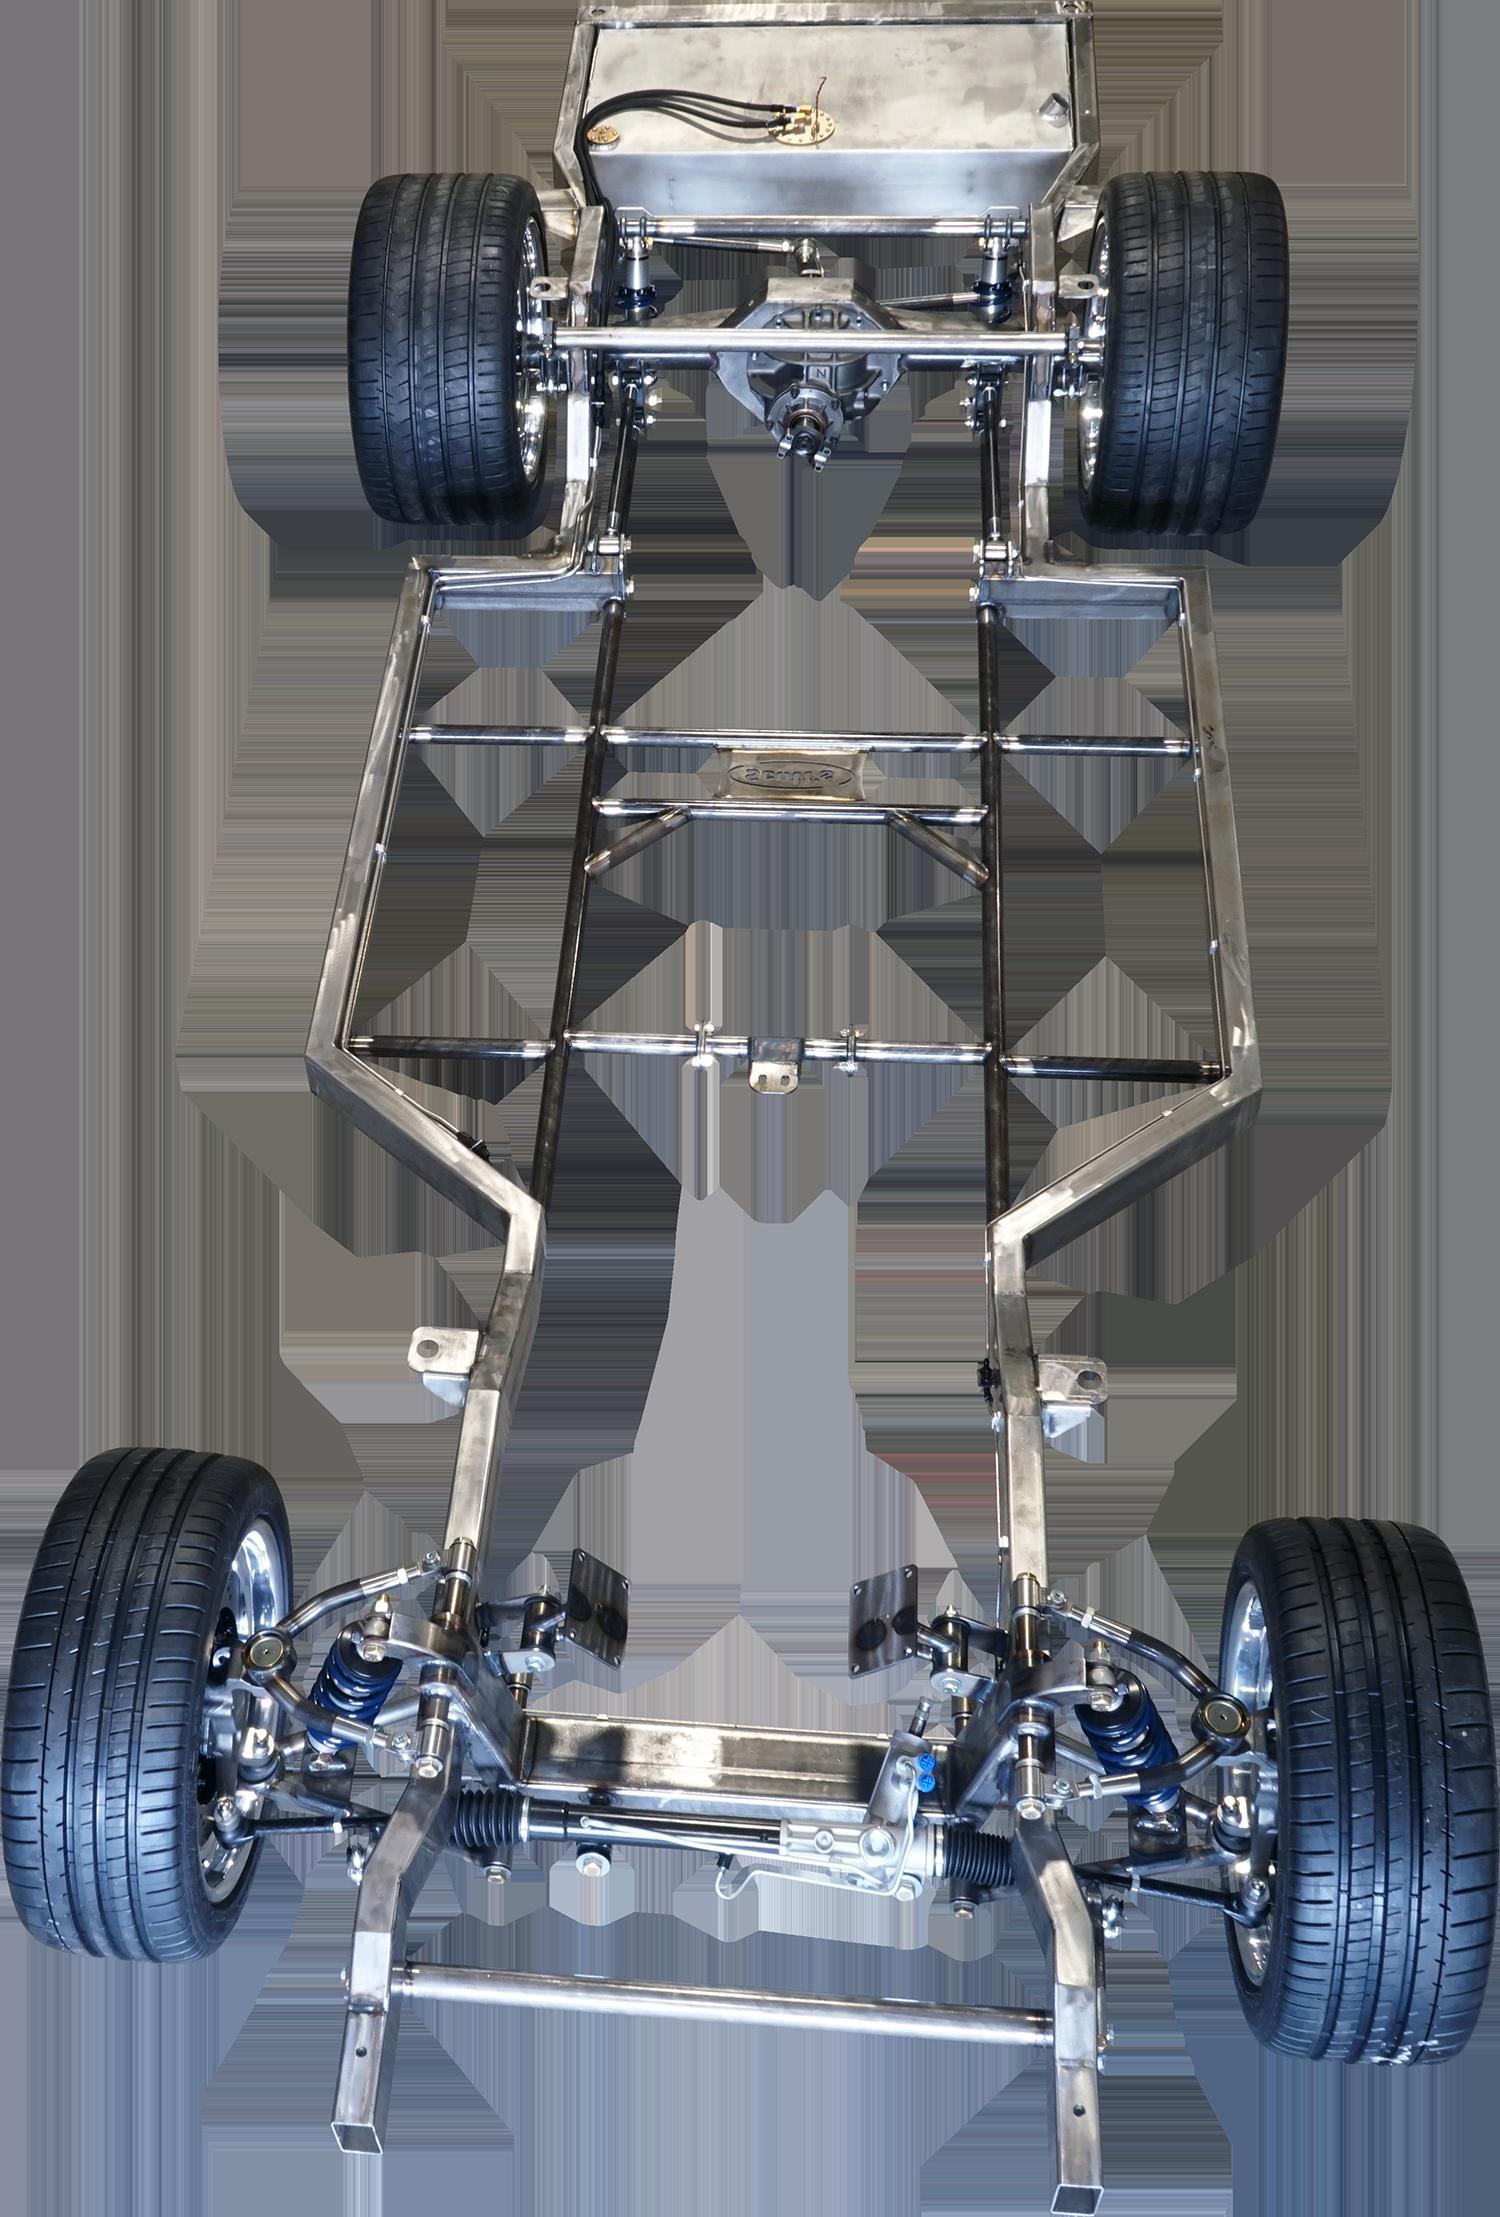 scotts-61-Impala-perimieter-chassis-2-web